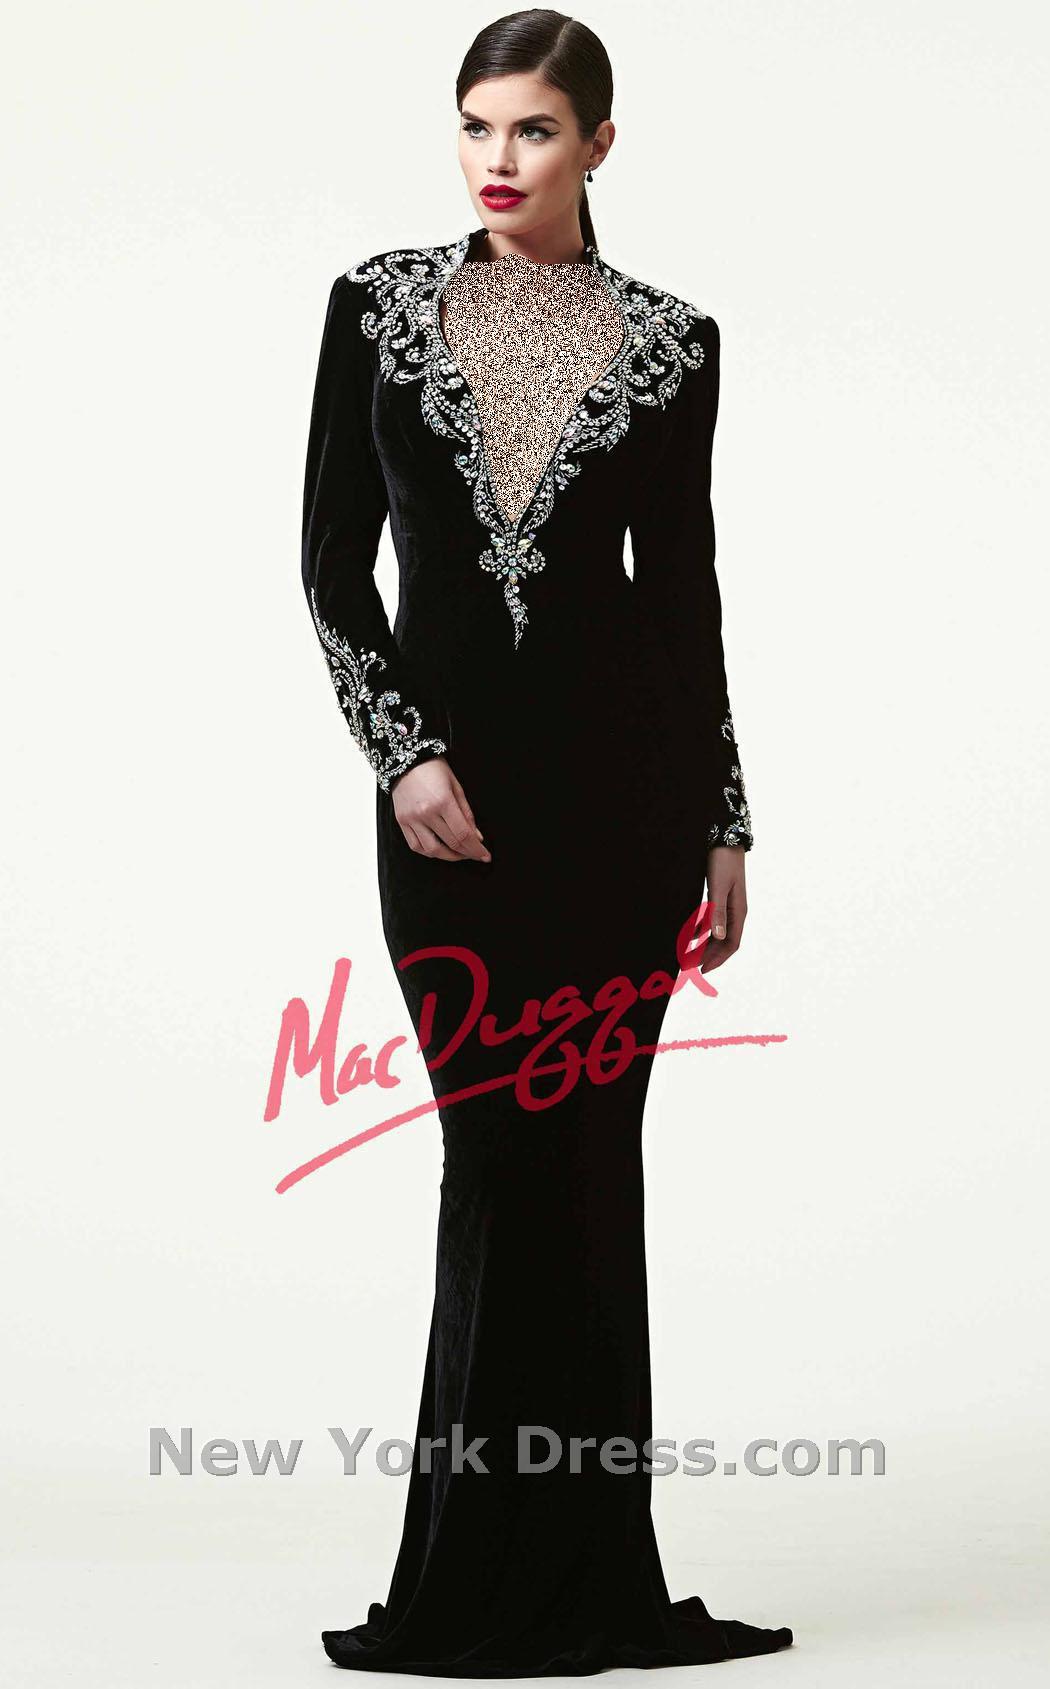 مدل مانتو لمه عکس مدل مو ترکی | سایت عکس